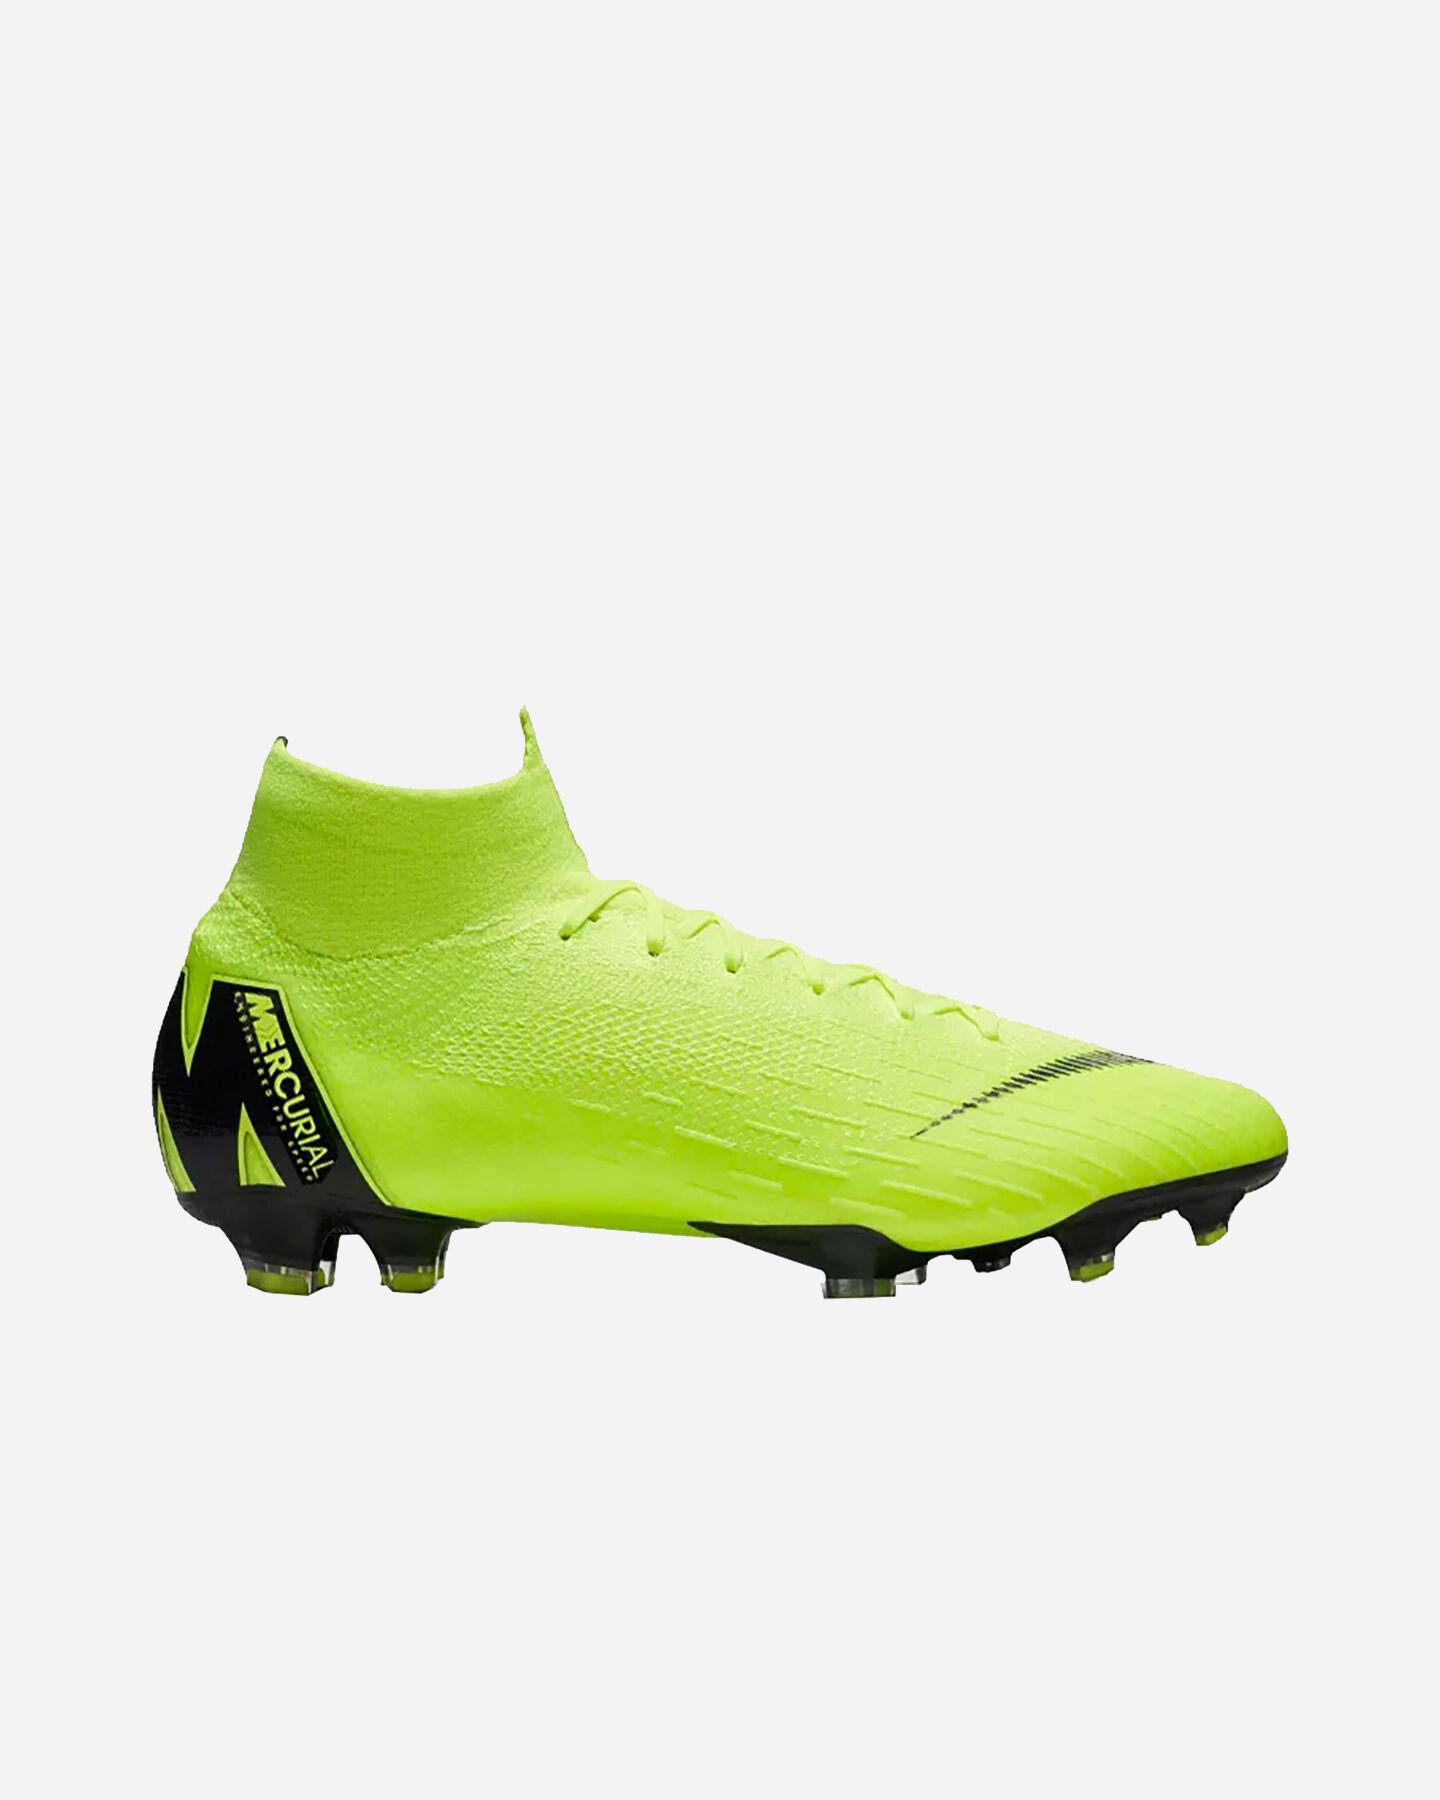 Adidas Sport Scarpette Calcetto Calcio Cisalfa Nike E Puma